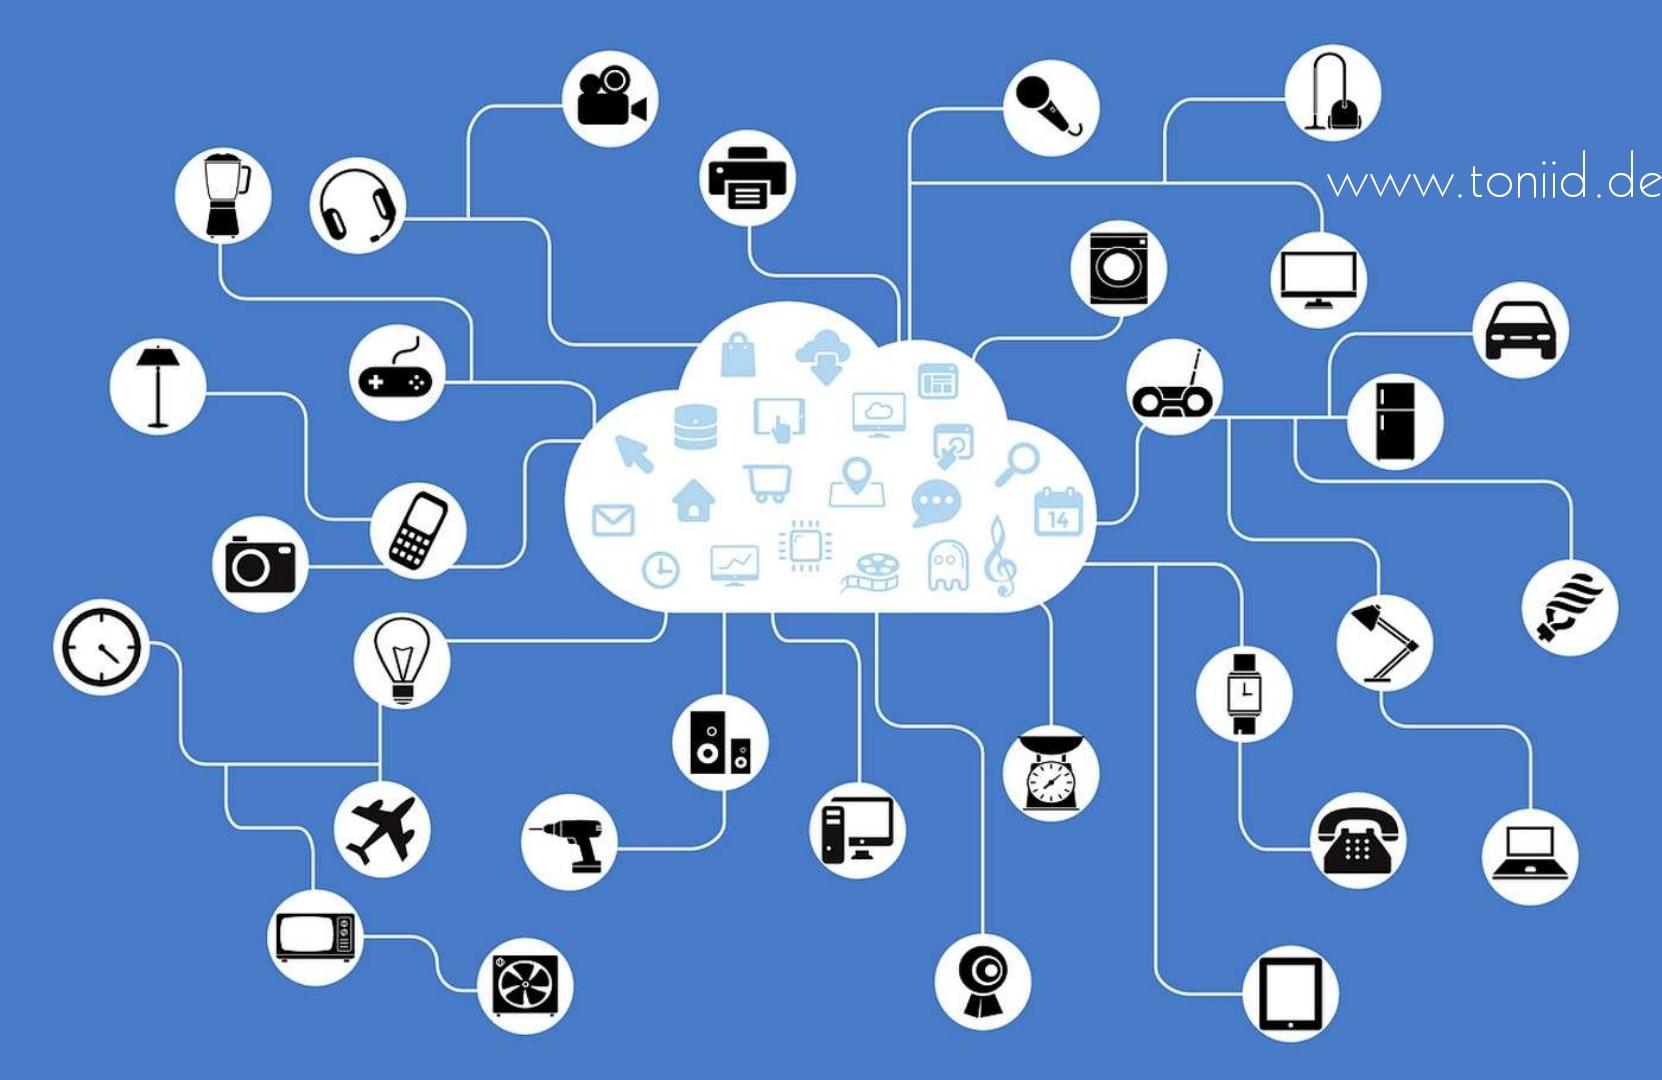 Internet of Things: apa itu?